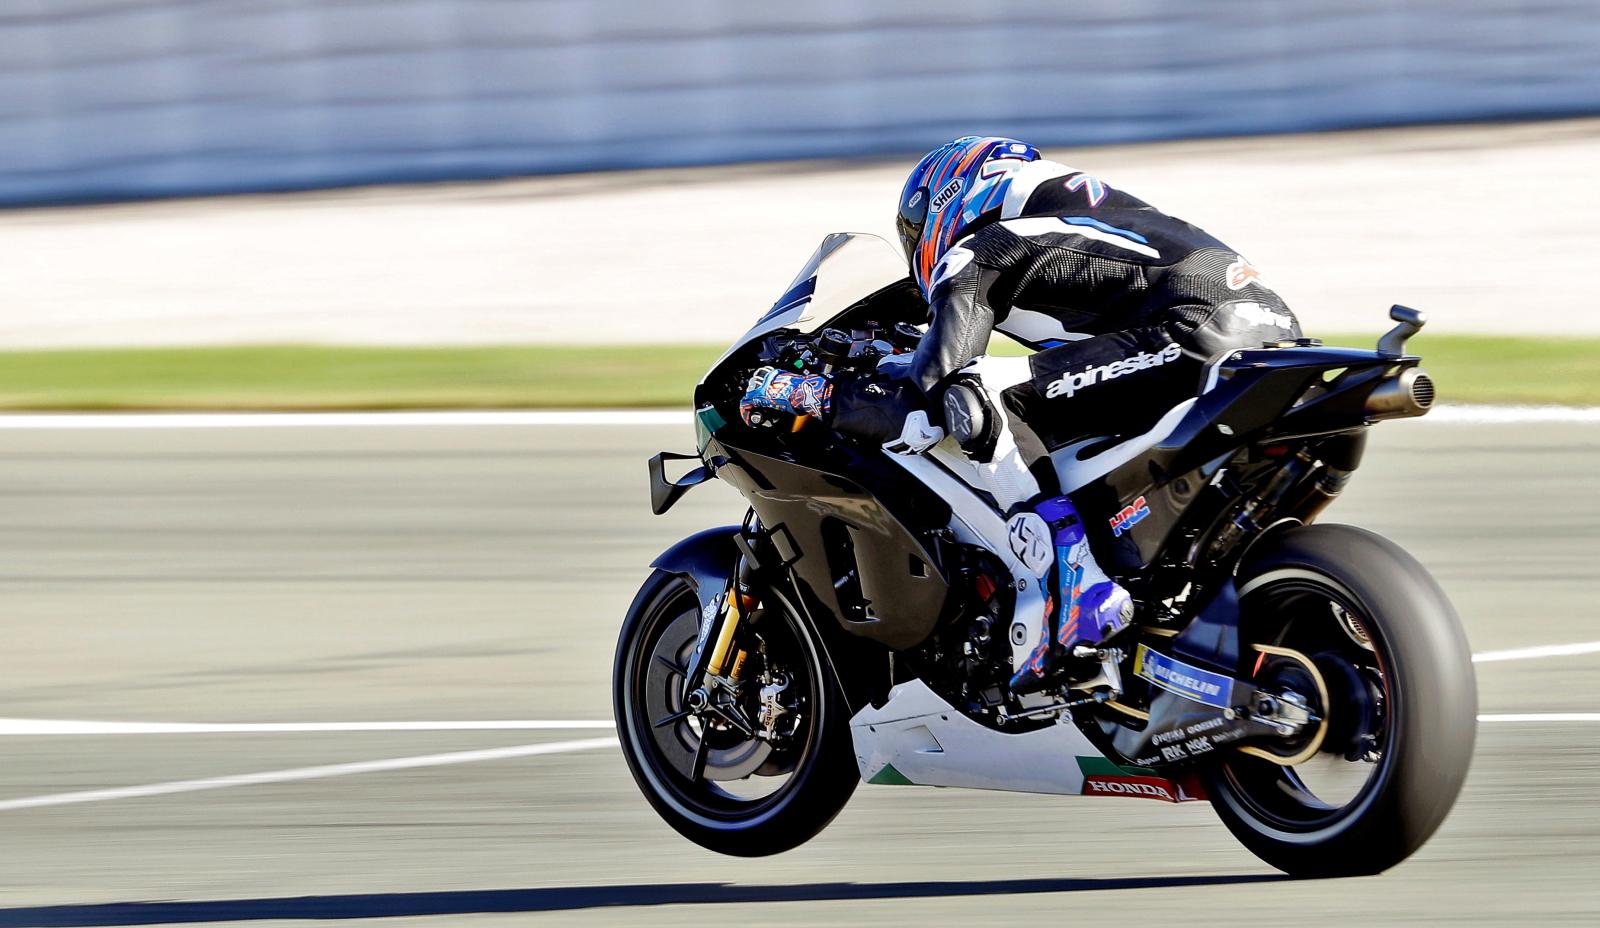 Wyścigi motocykli fot. EPA/MANUEL BRUQUE